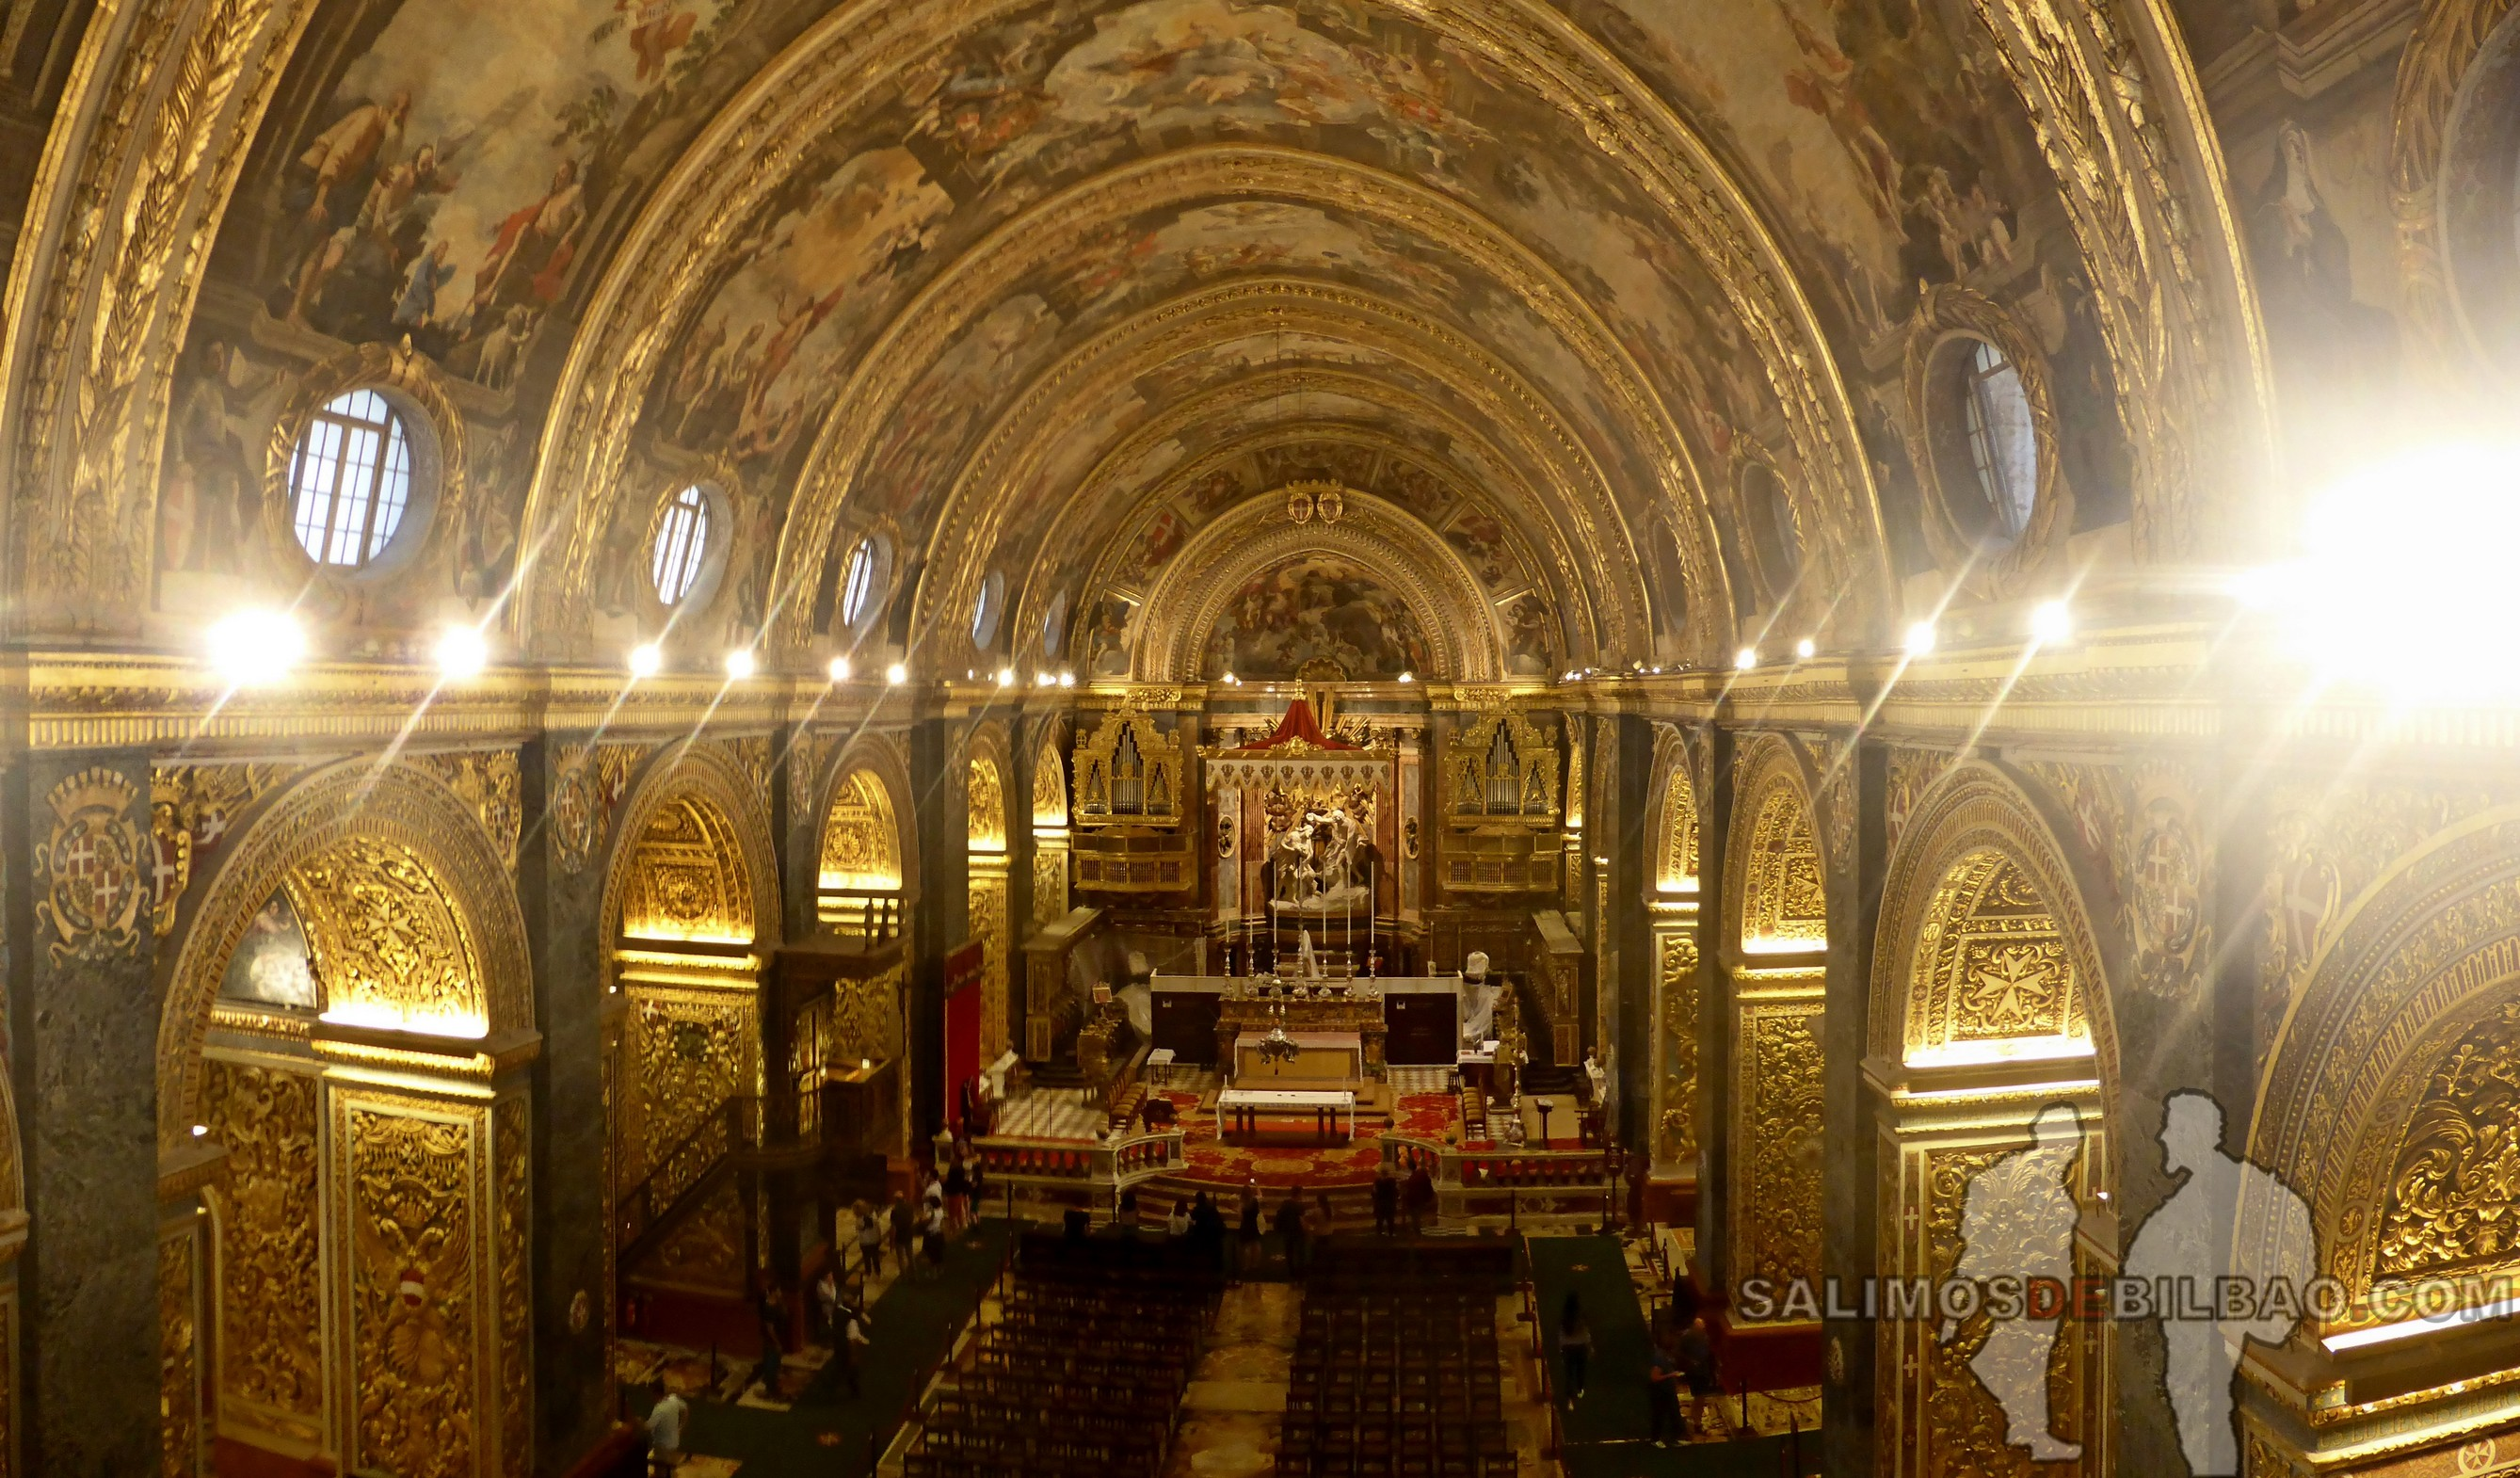 0637. Pano, Interior de la ConCatedral, La Valeta, Malta